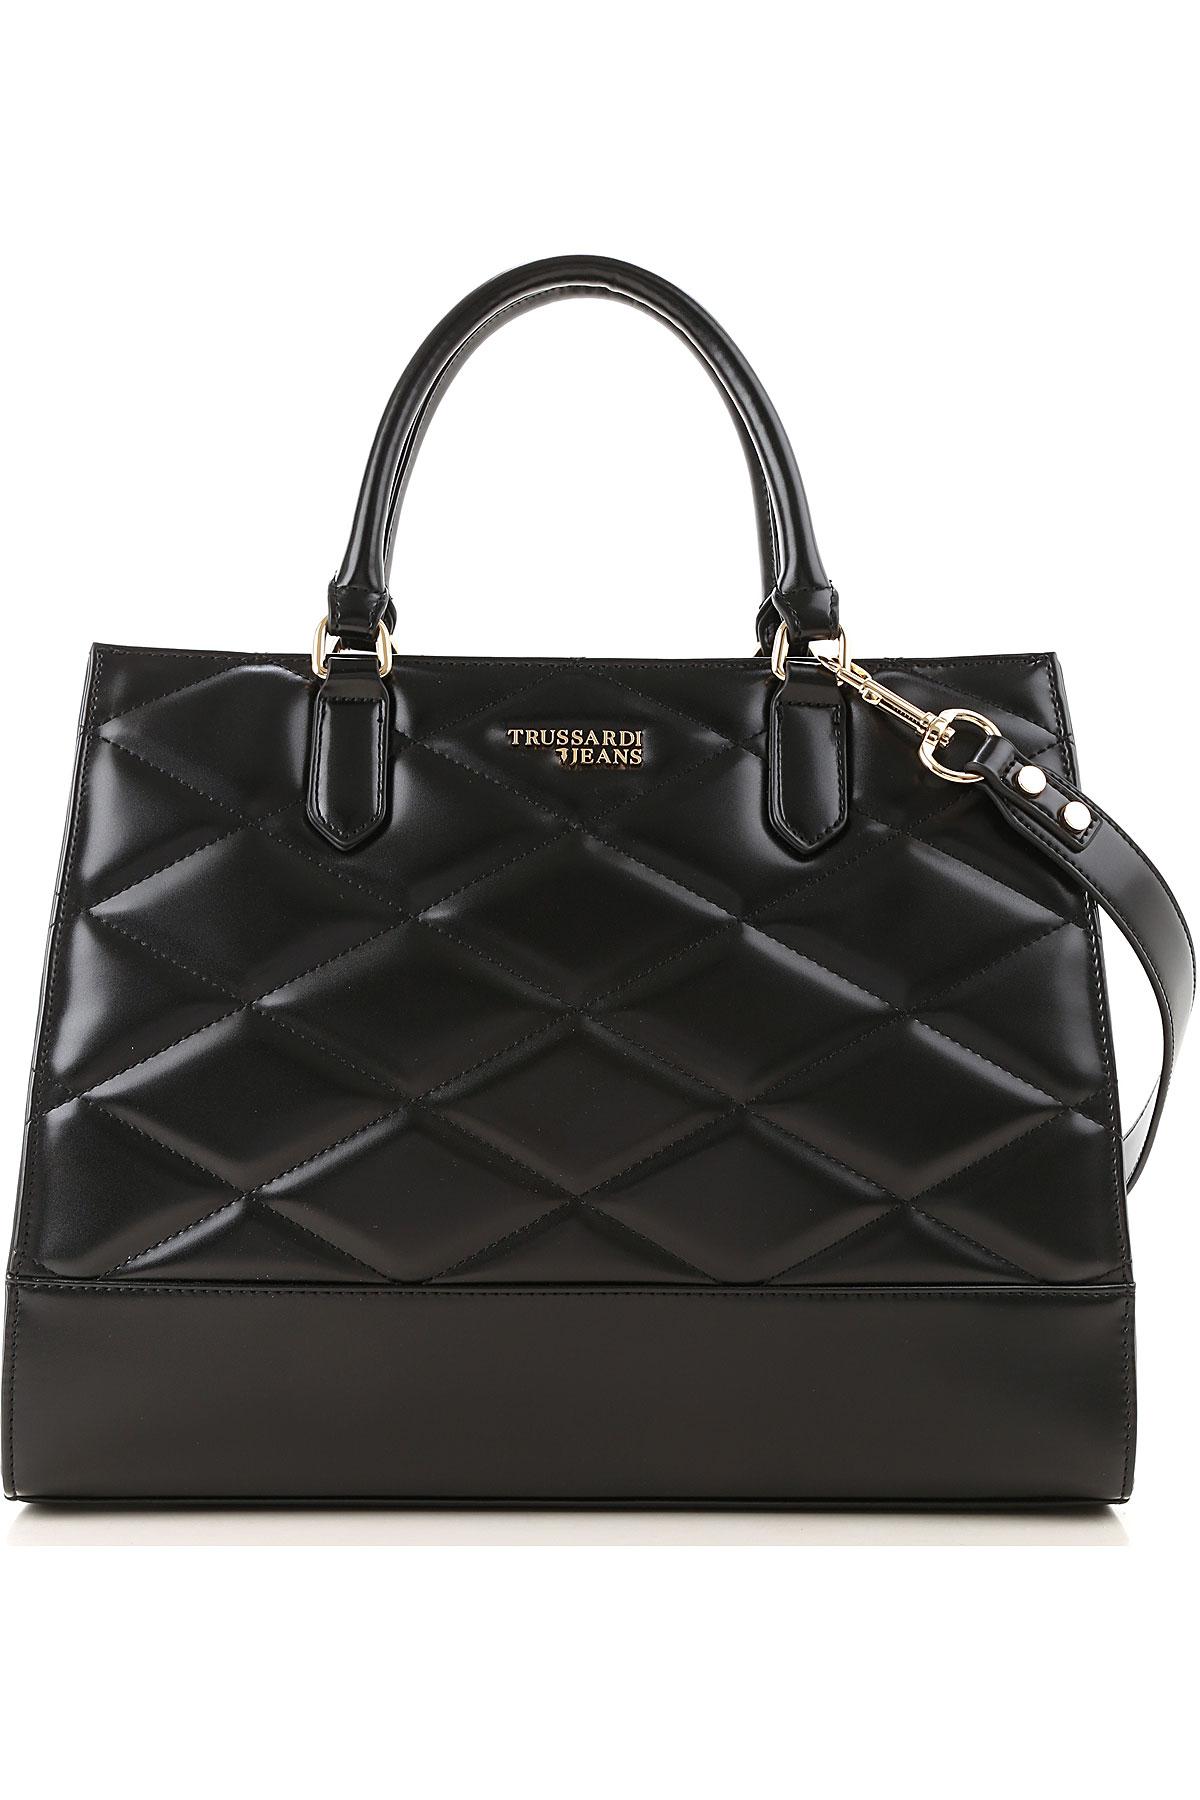 Trussardi Top Handle Handbag On Sale, Black, Eco Leather, 2019